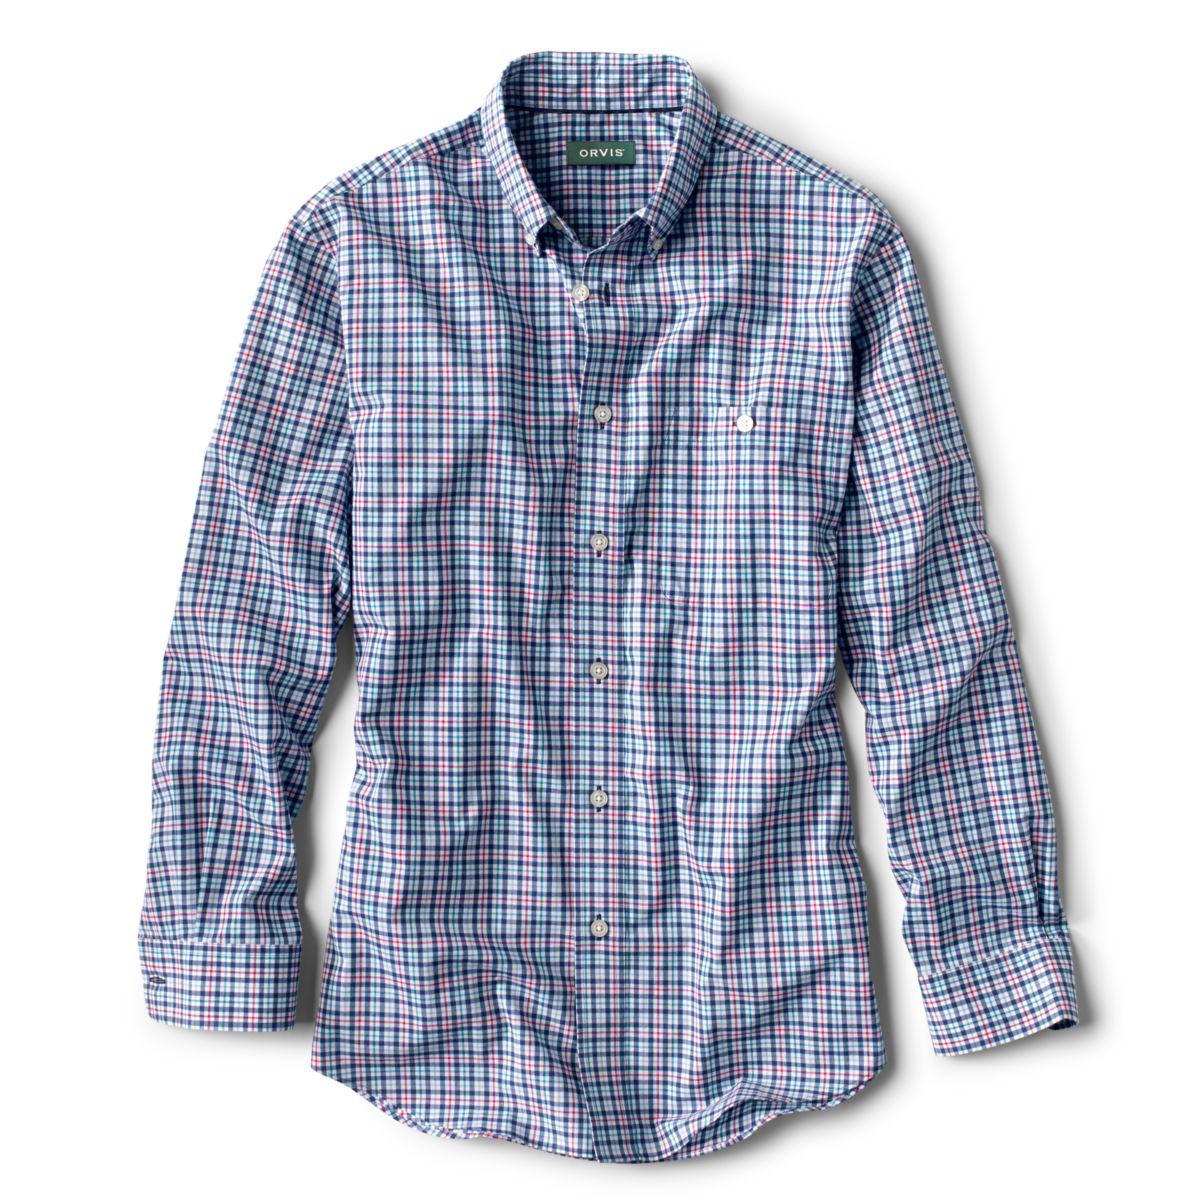 PerfectTemp Check Long-Sleeved Shirt - image number 0